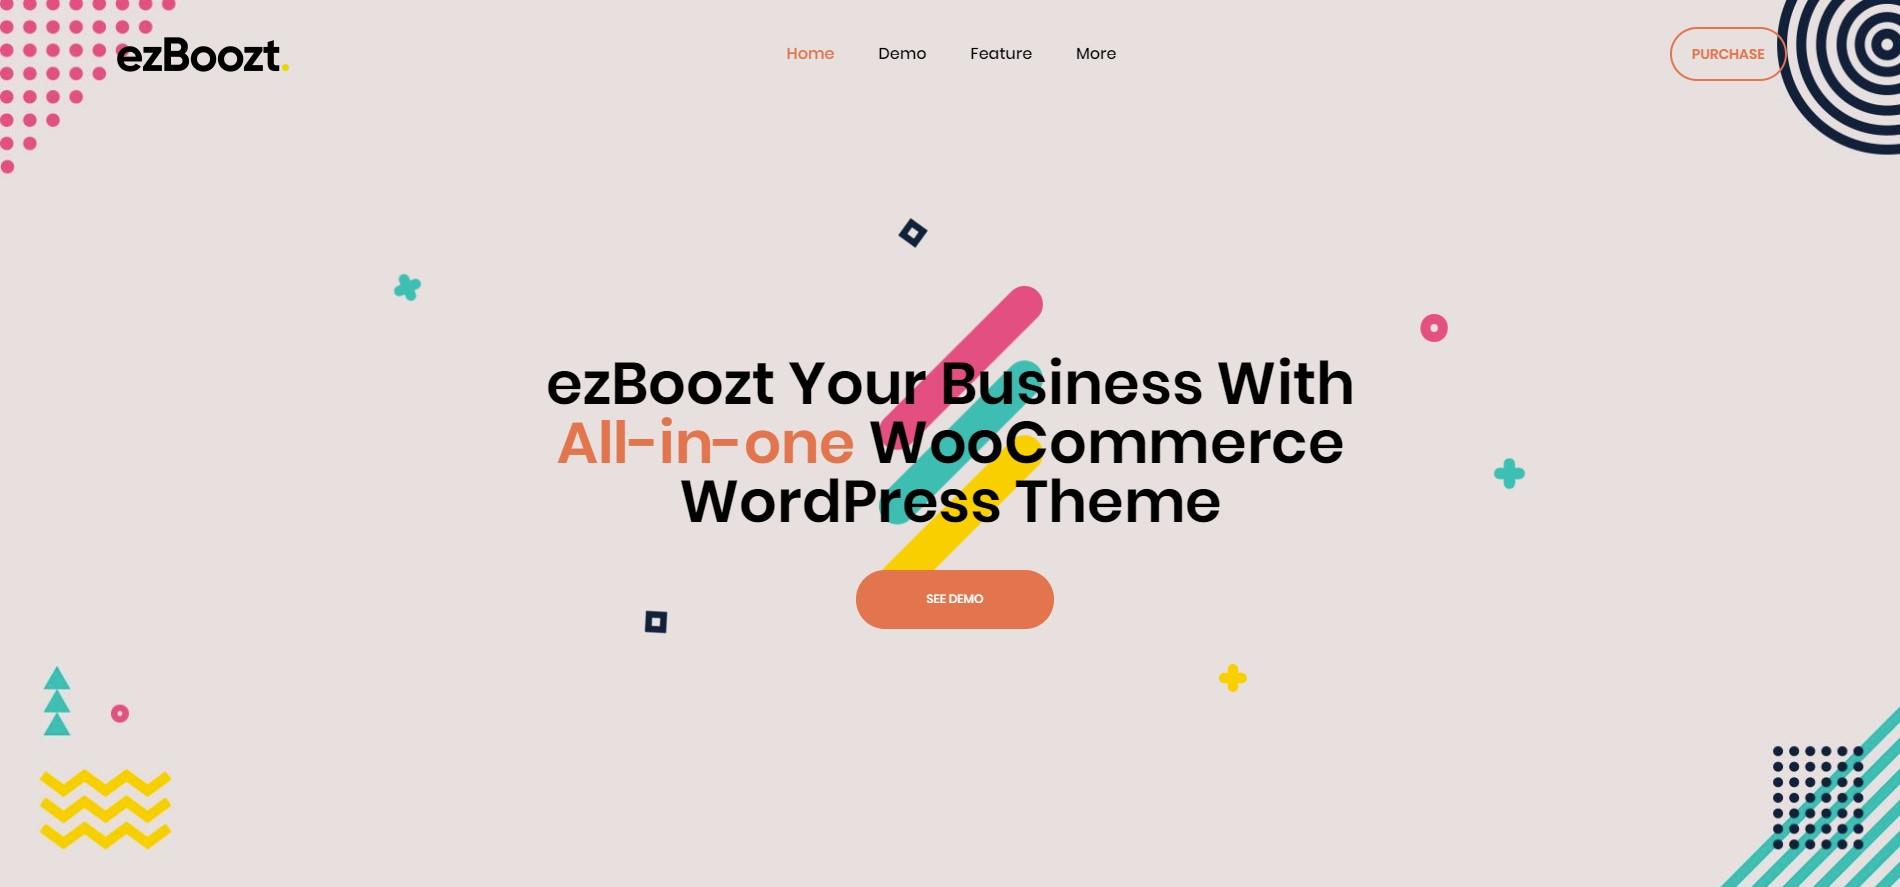 EzBoozt – All-in-one WooCommerce WordPress Theme